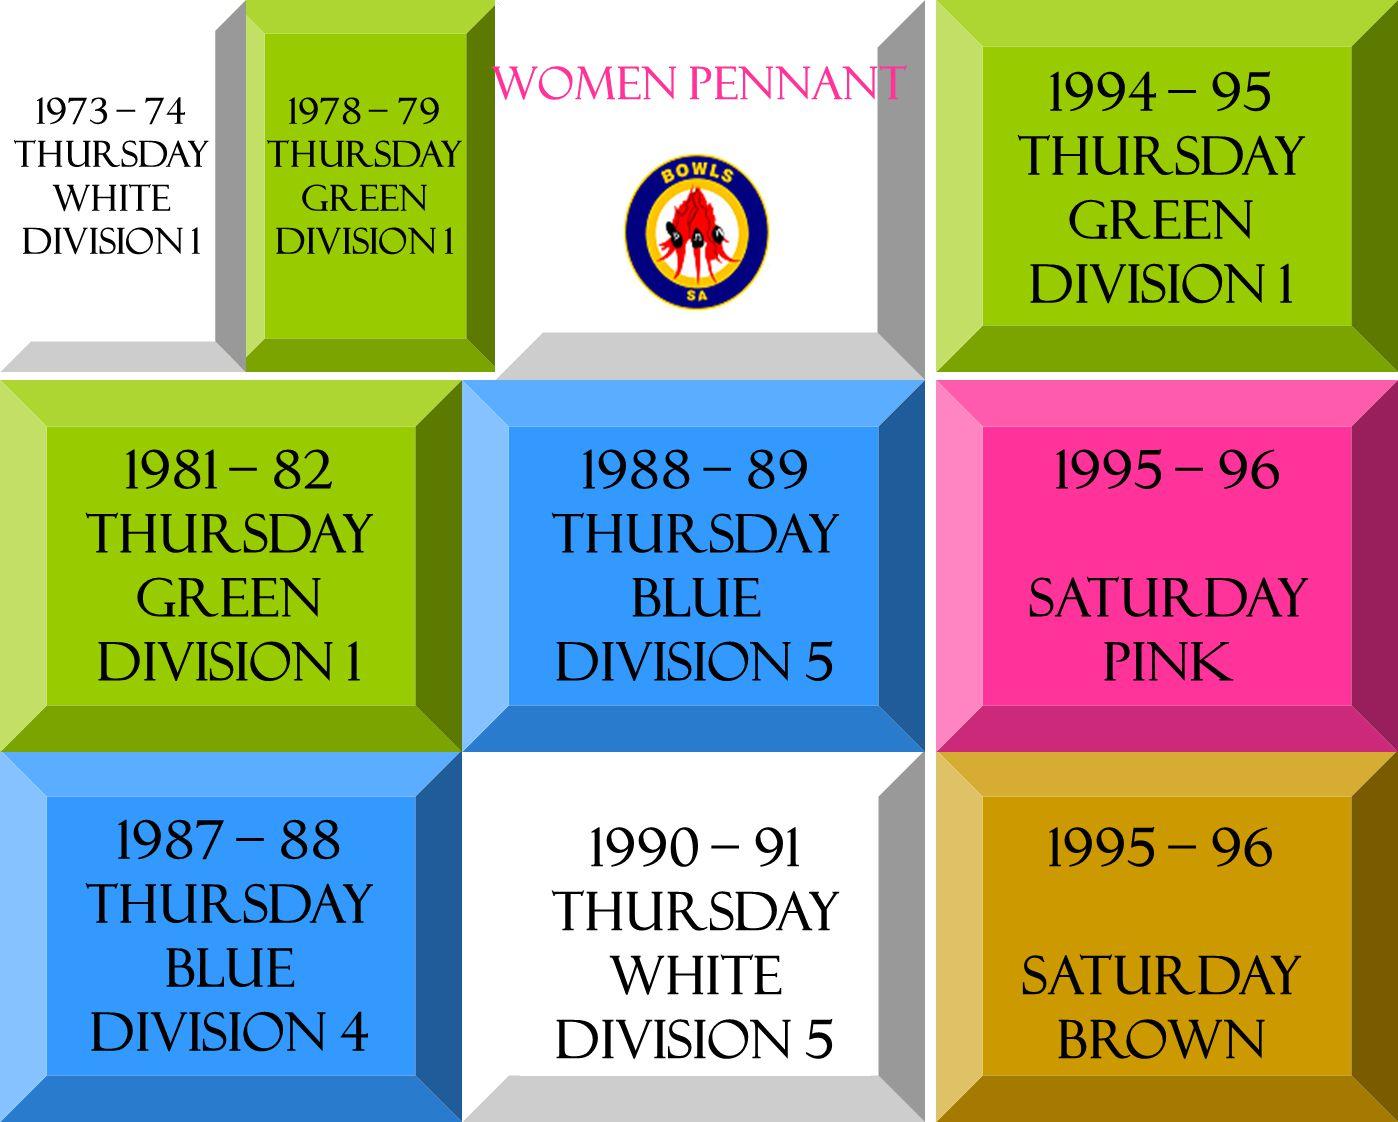 1978 – 79 Thursday green DIVISION 1 1981 – 82 Thursday green DIVISION 1 1987 – 88 Thursday blue DIVISION 4 1988 – 89 Thursday blue DIVISION 5 1990 – 9